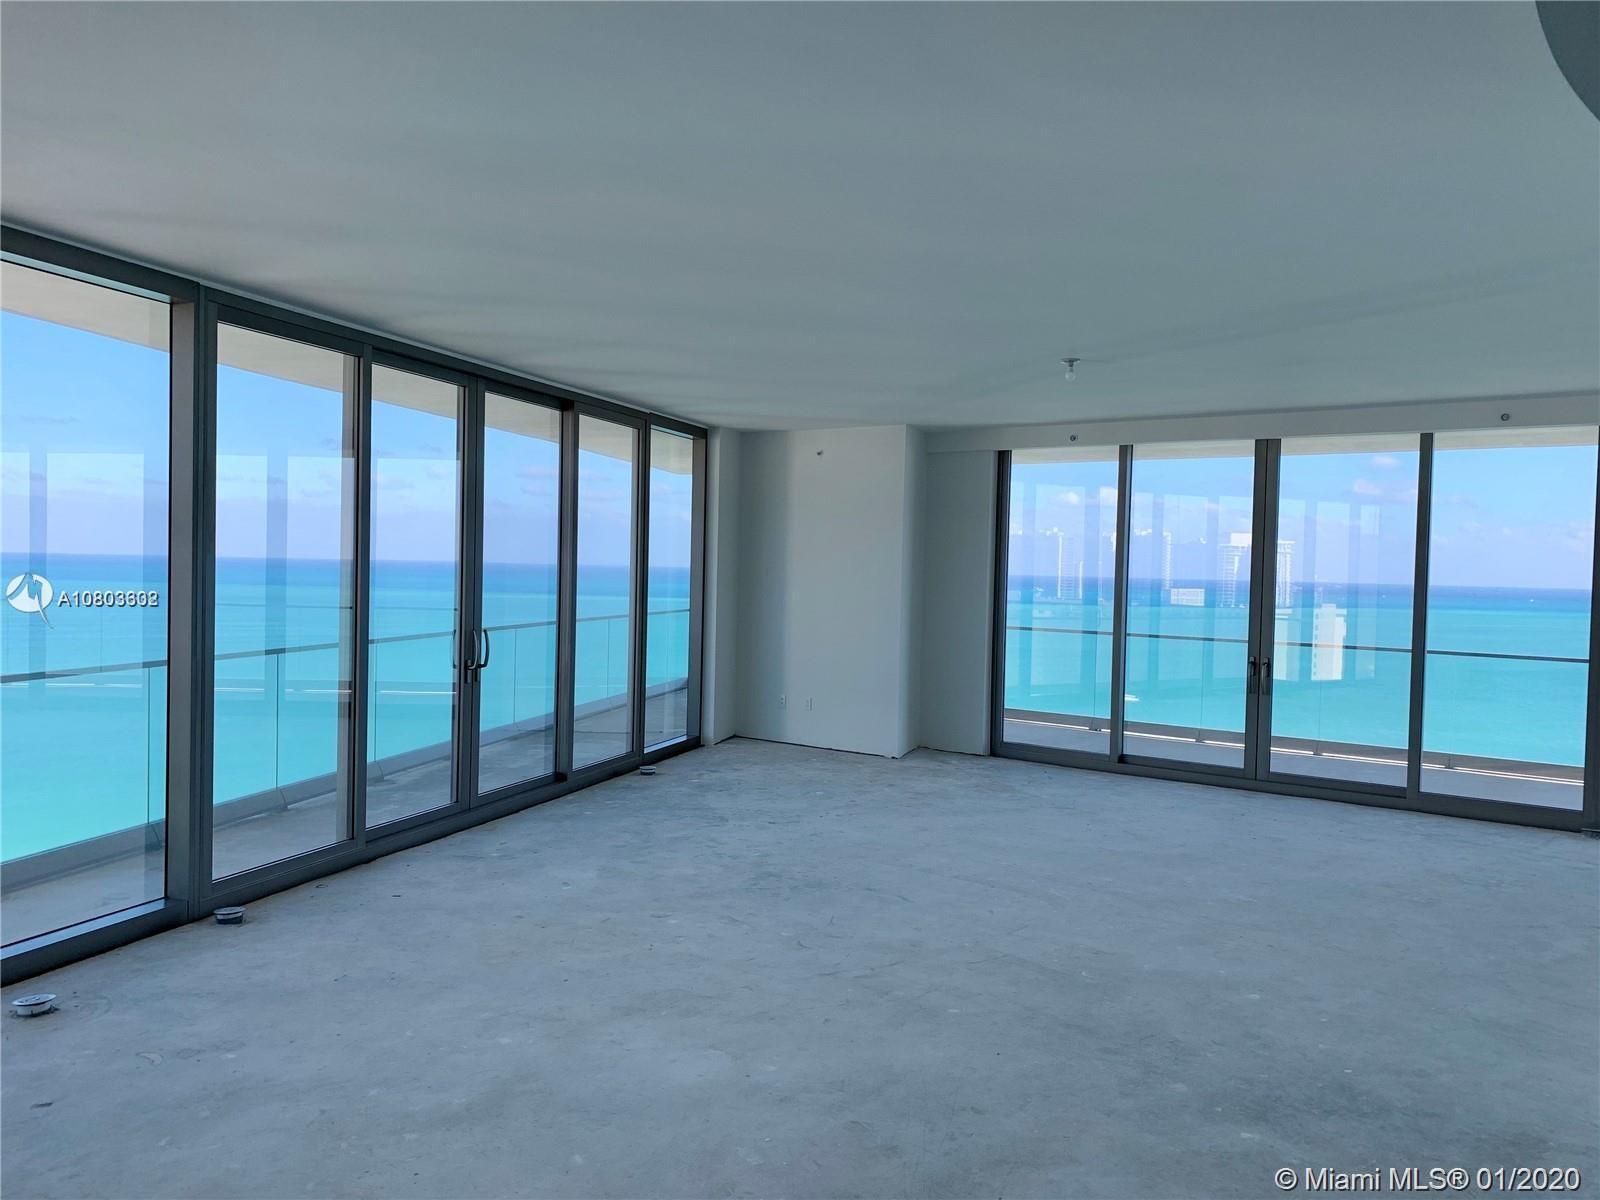 image #1 of property, Armani Casa, Unit 1500